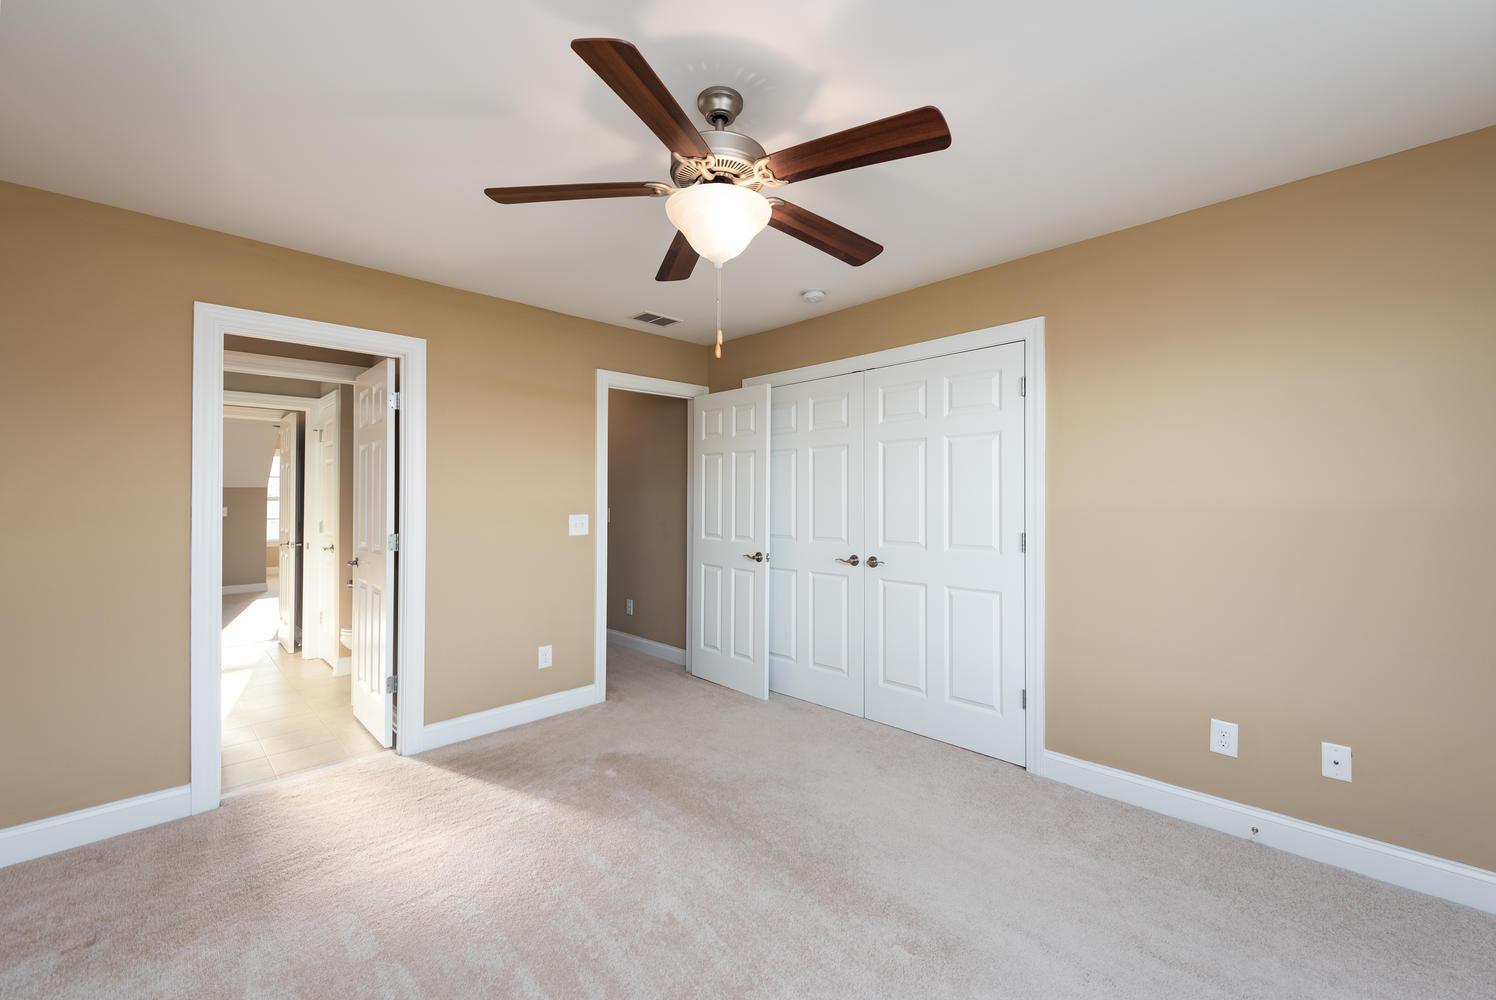 River Reach Pointe Homes For Sale - 1216 Rivers Reach Drive, Charleston, SC - 35